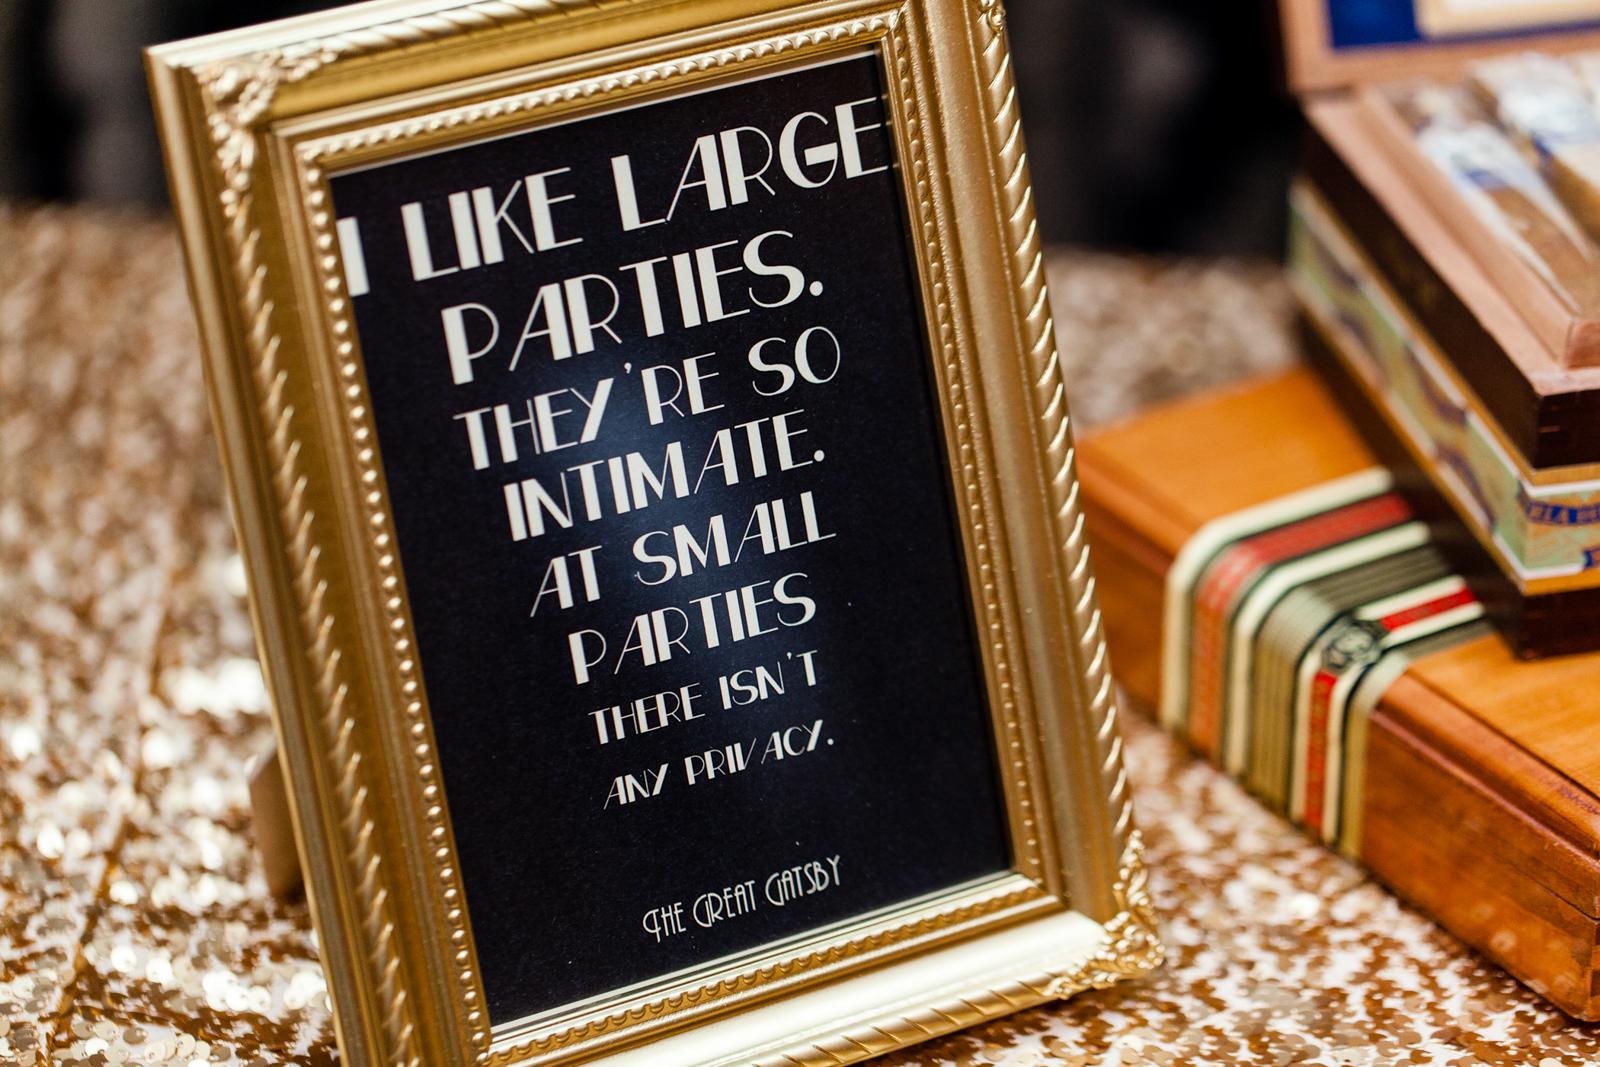 popular wedding themes you should not use inside weddings